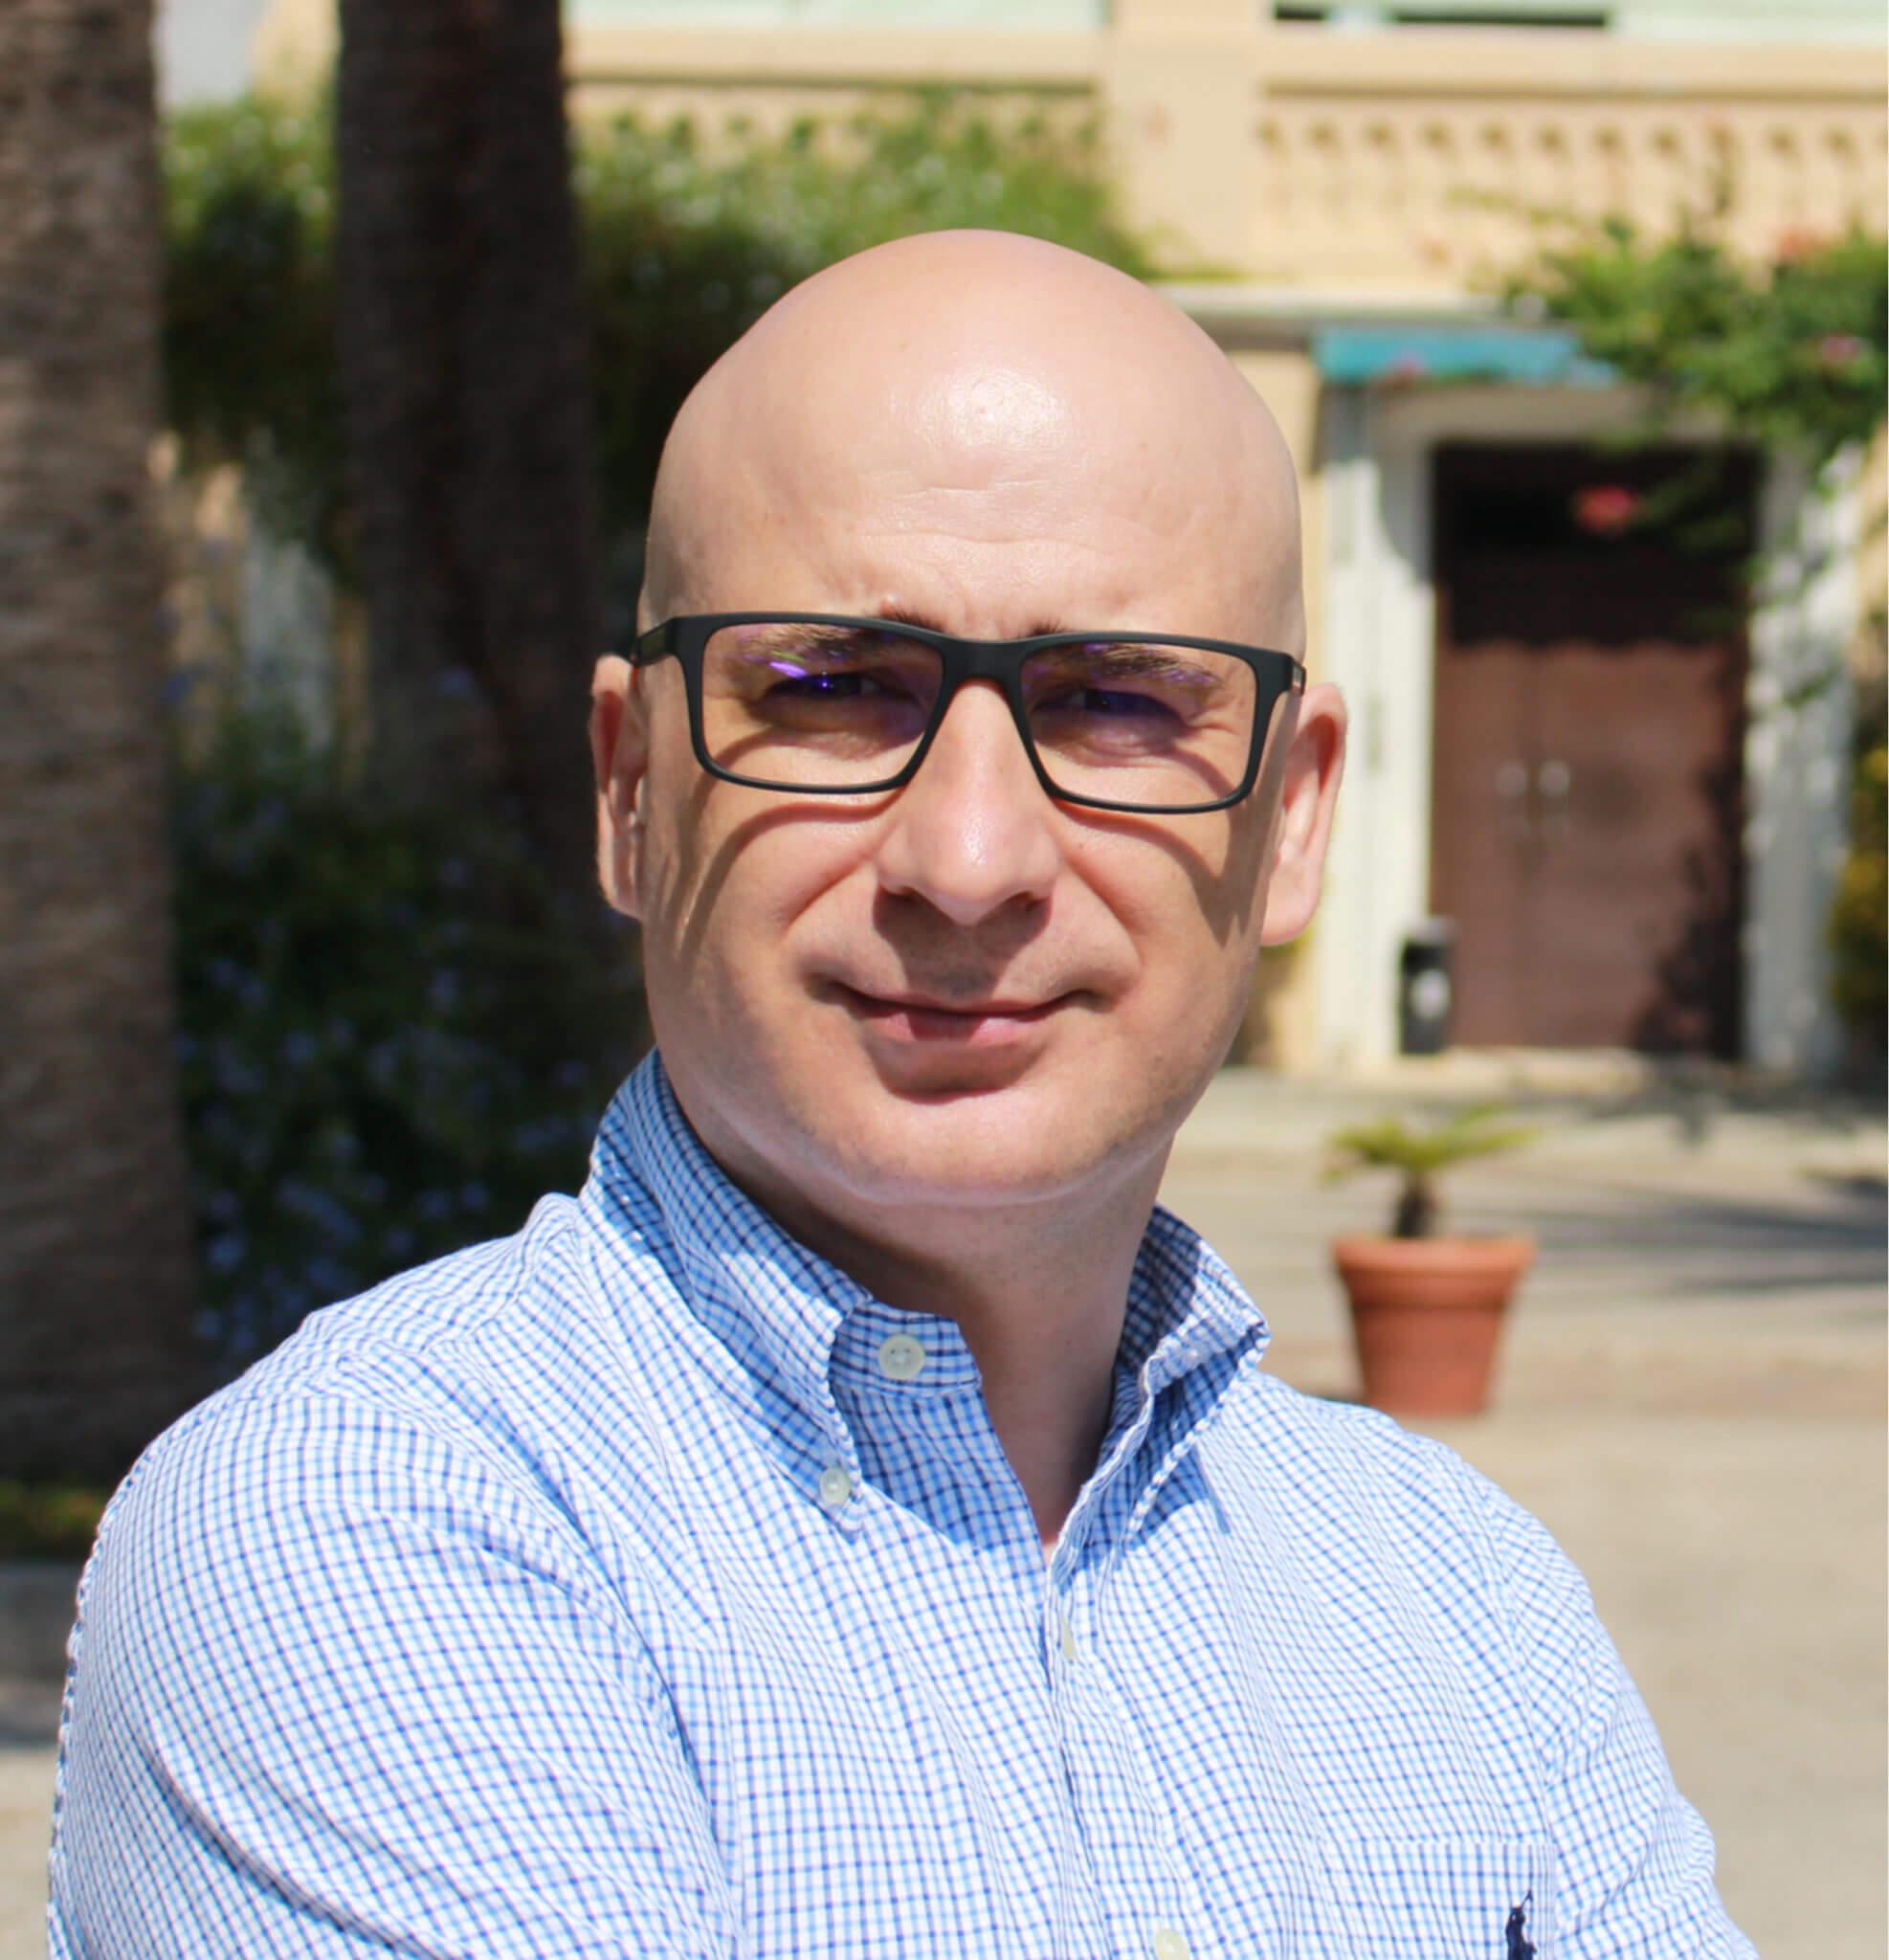 Cristobal Alonso